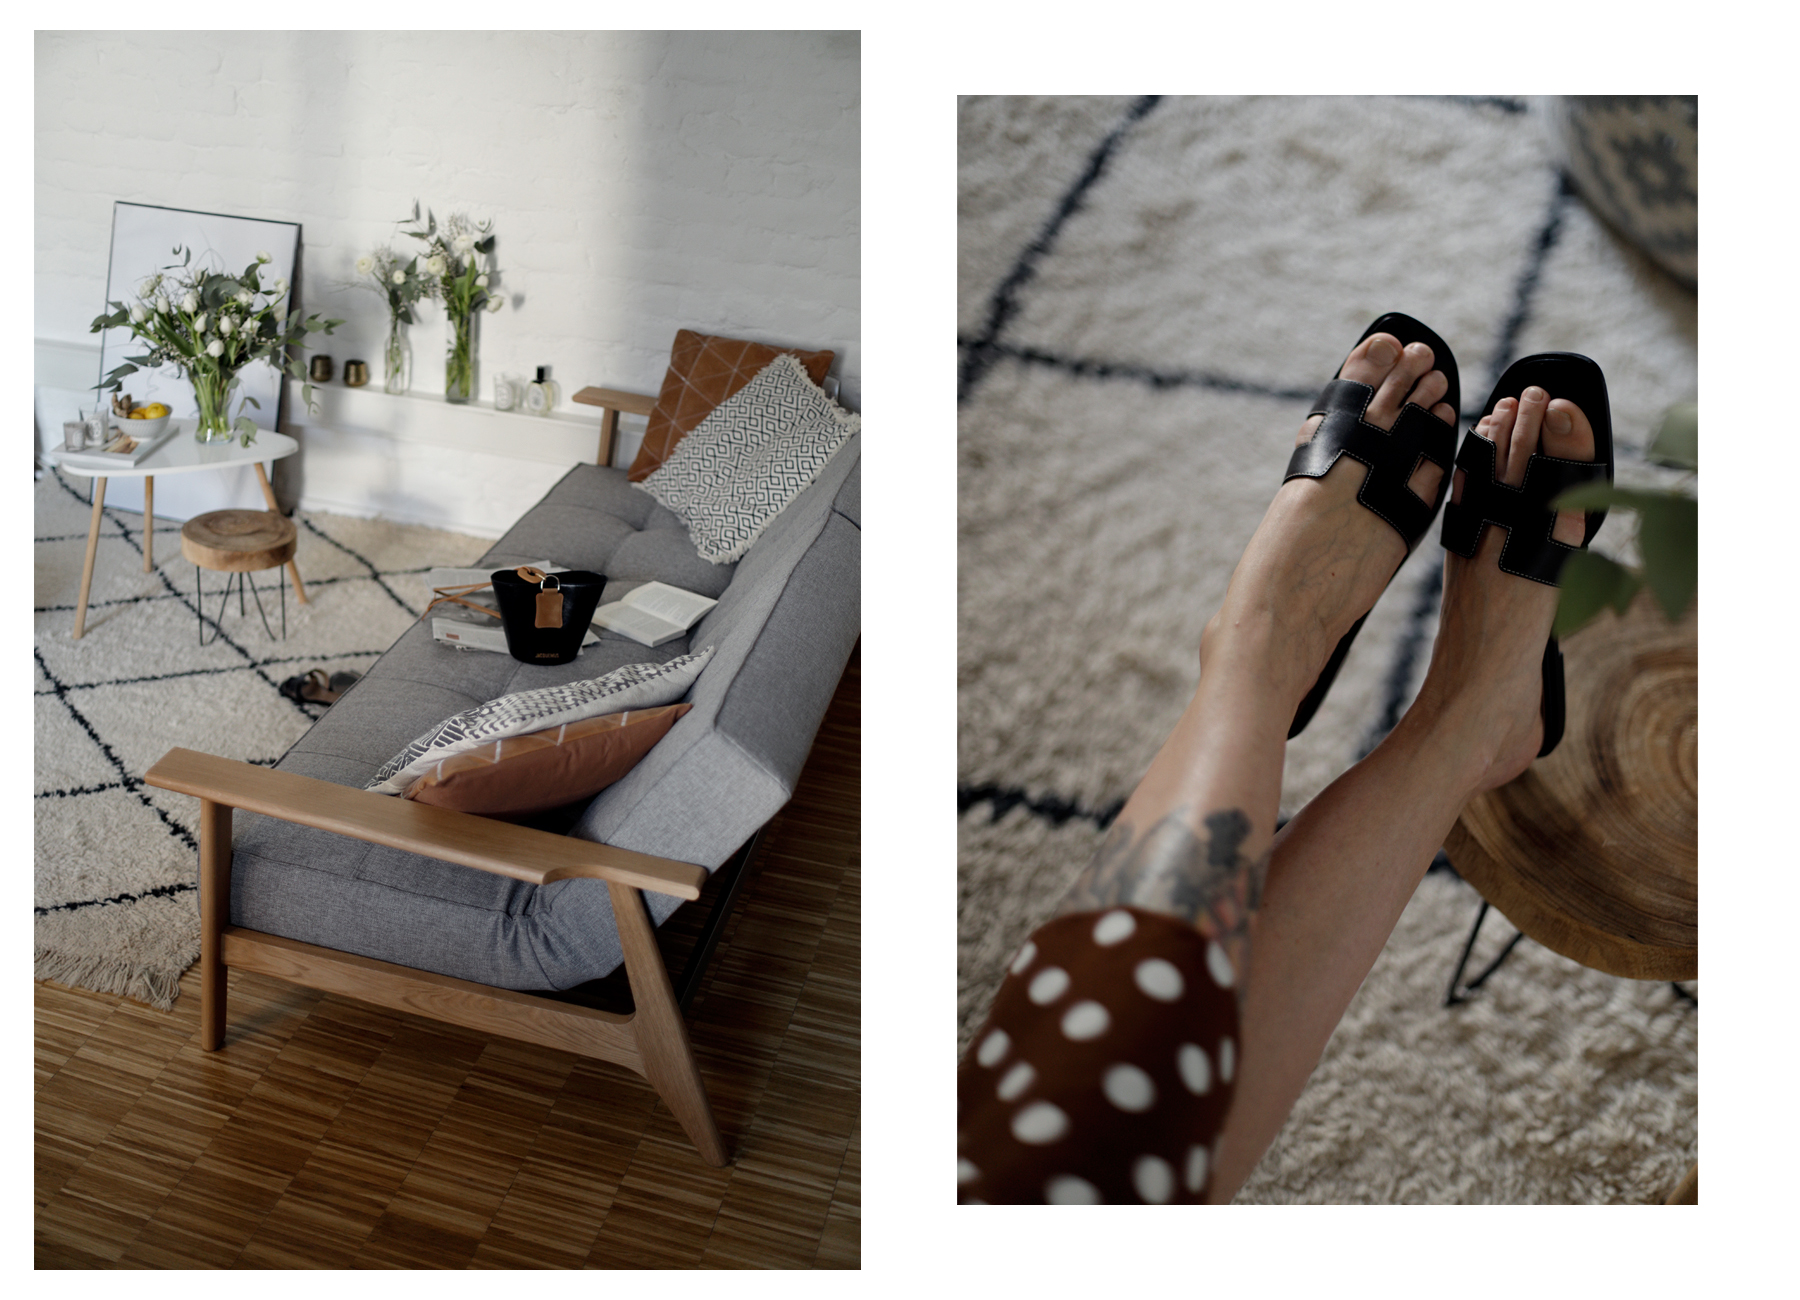 home24 couch impression schlafsofa sleeping couch relax danish design mid-century wooden beni ourain morrocan carpet styleblogger fashionbloger interior lifestyle blog ricarda schernus modeblogger hermes oran homestory catsanddogsblog max bechmann 4